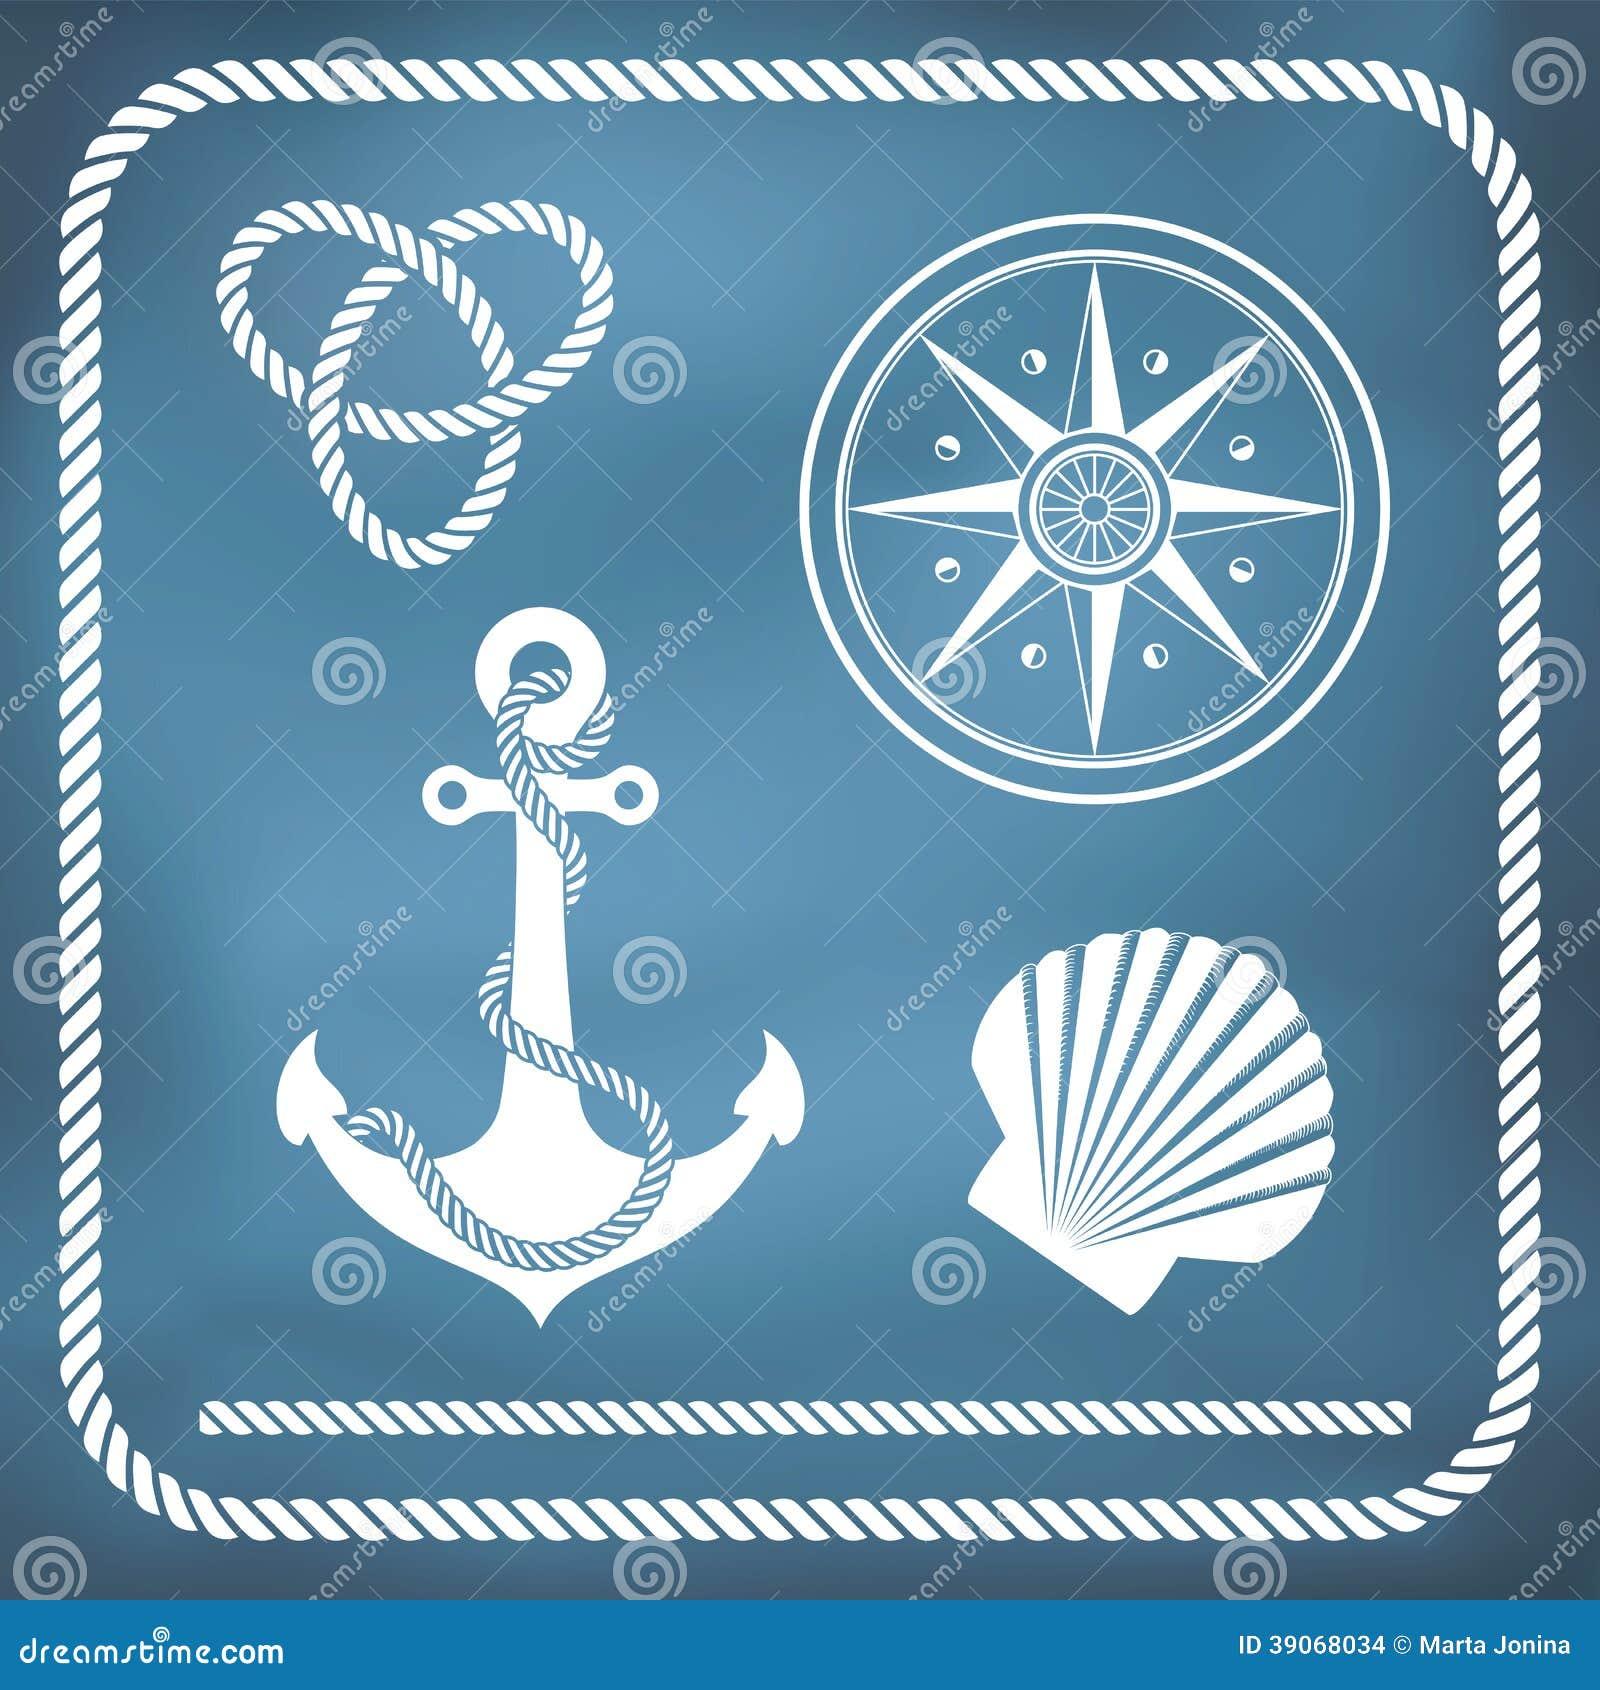 Nautical Symbols And Meanings Nautical Symbols Stock...